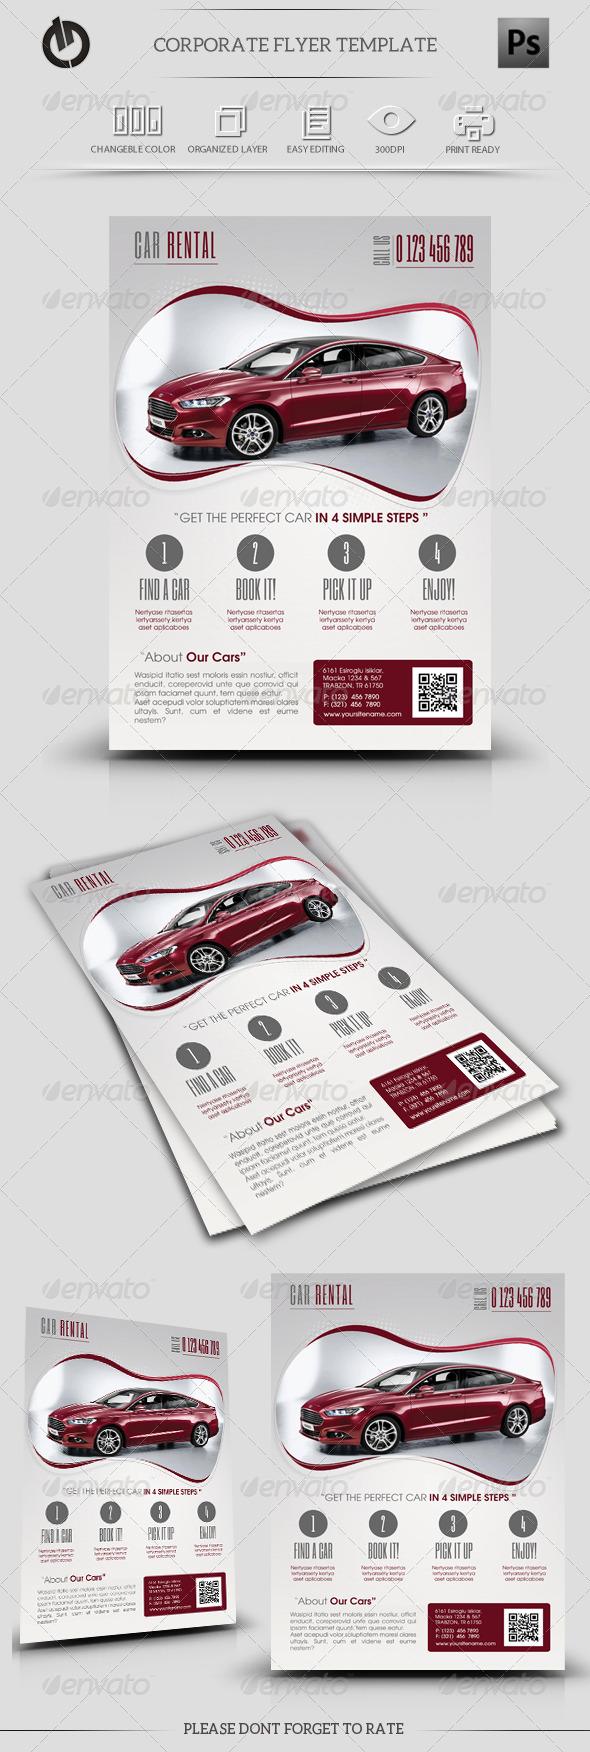 Car Rental Flyer Template  - Corporate Flyers